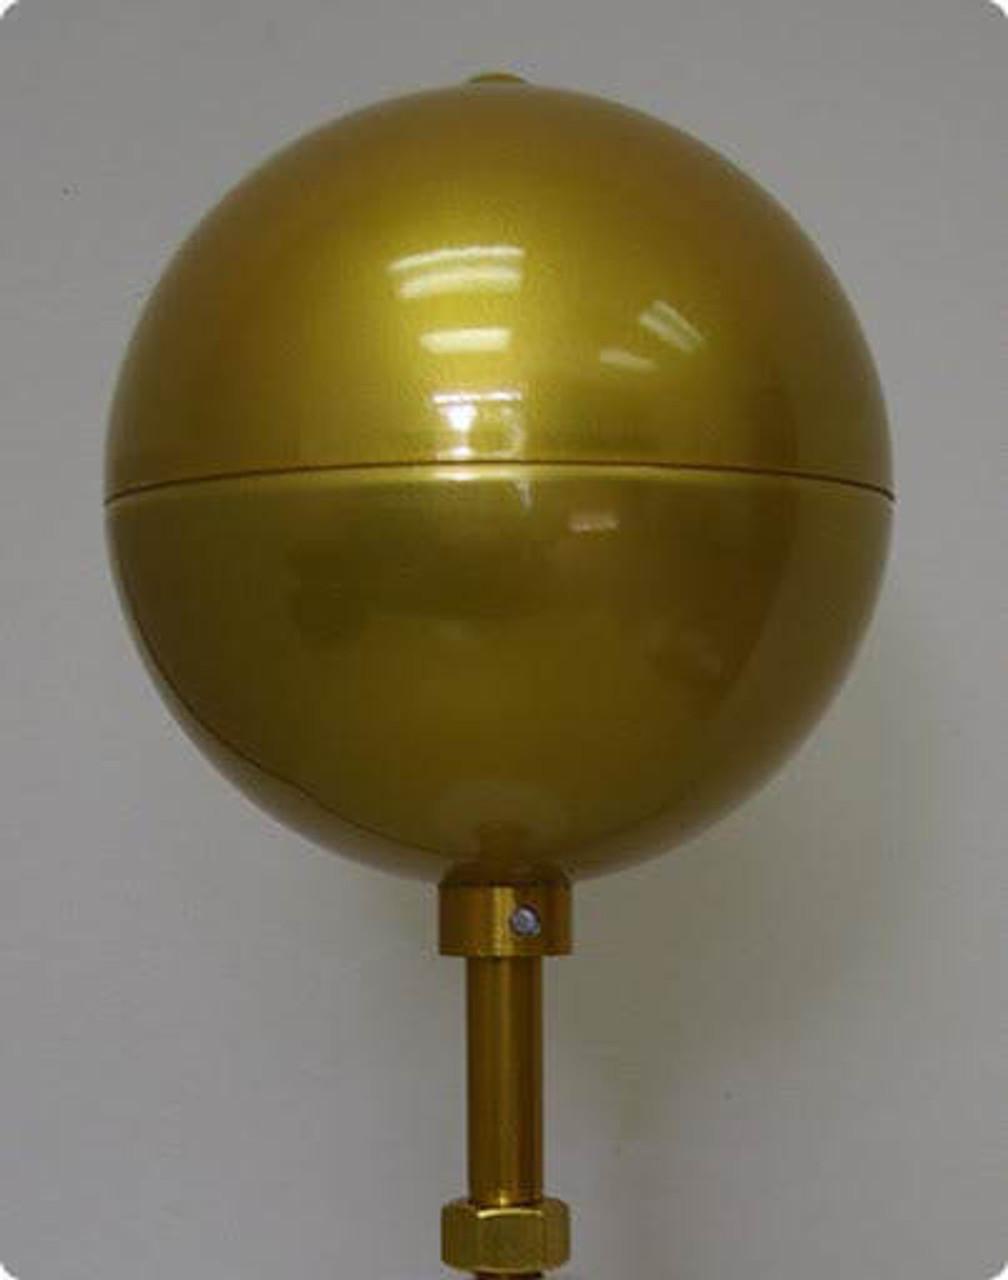 Nautical Fiberglass Flagpole Ball Ornament